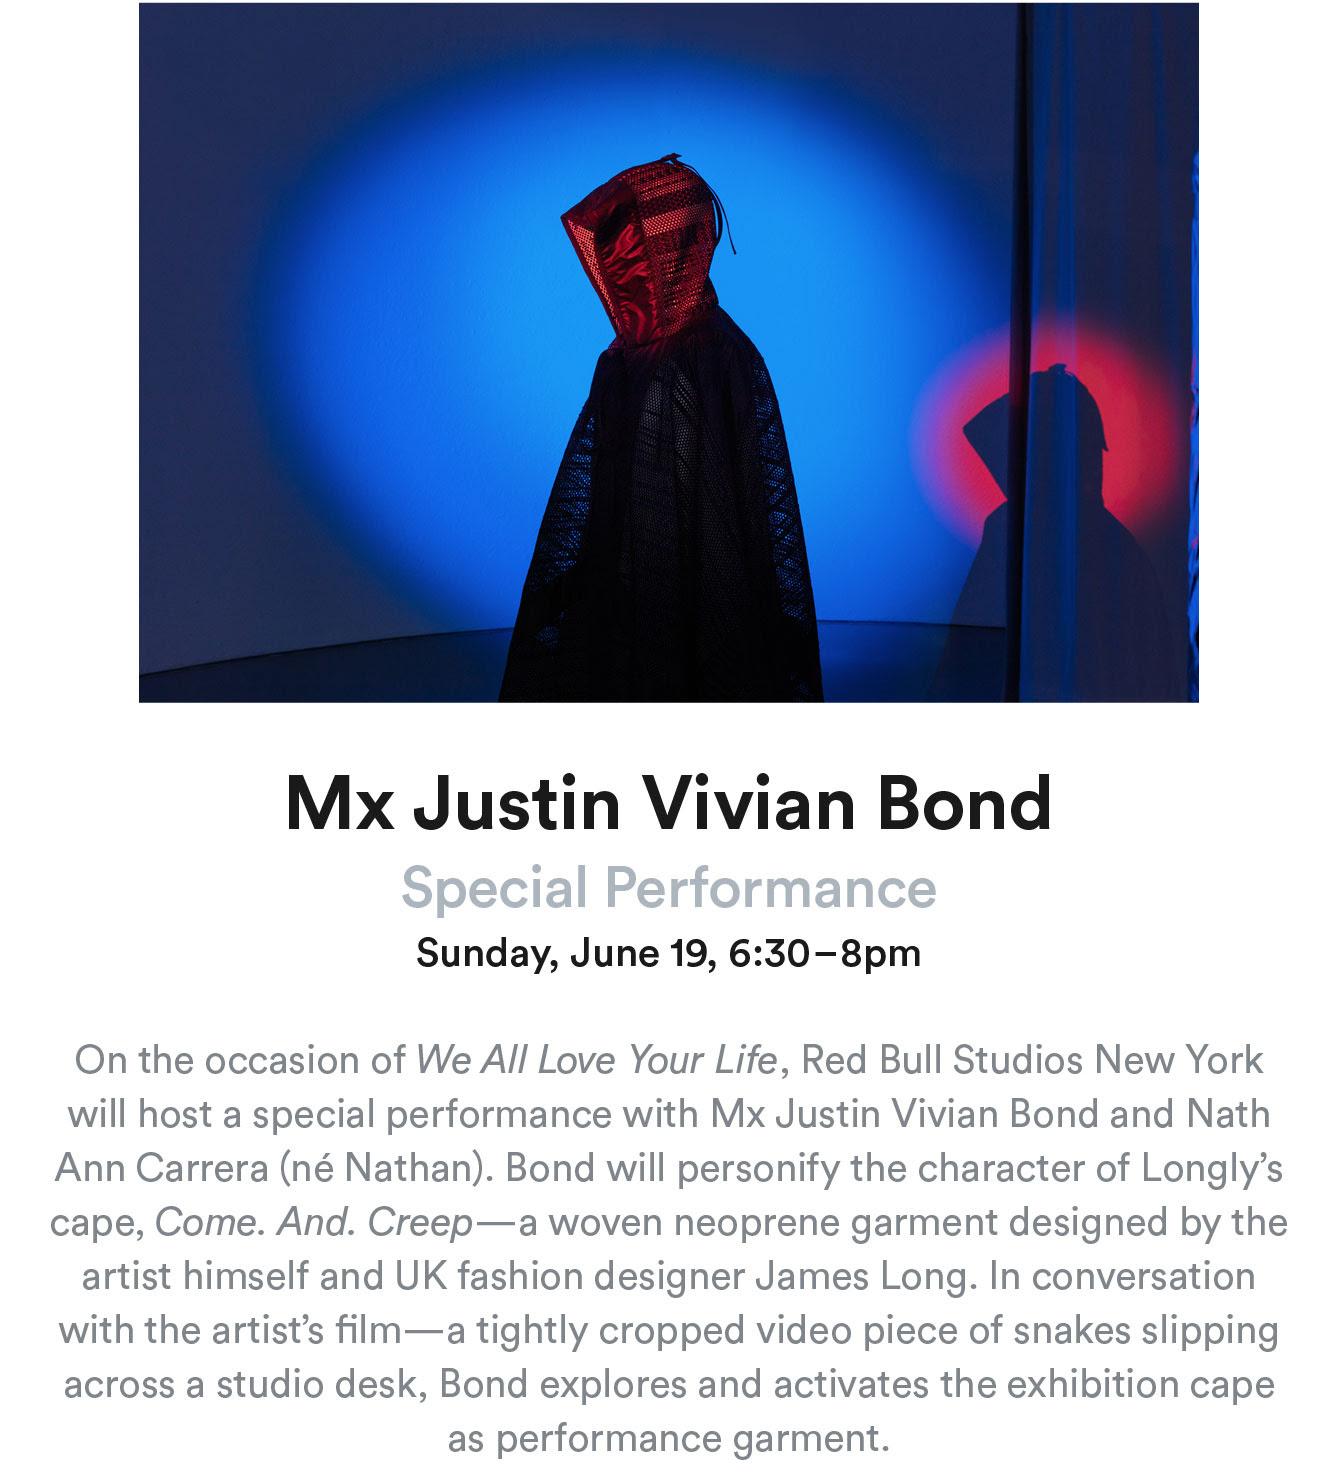 Mx Justin Vivian Bond